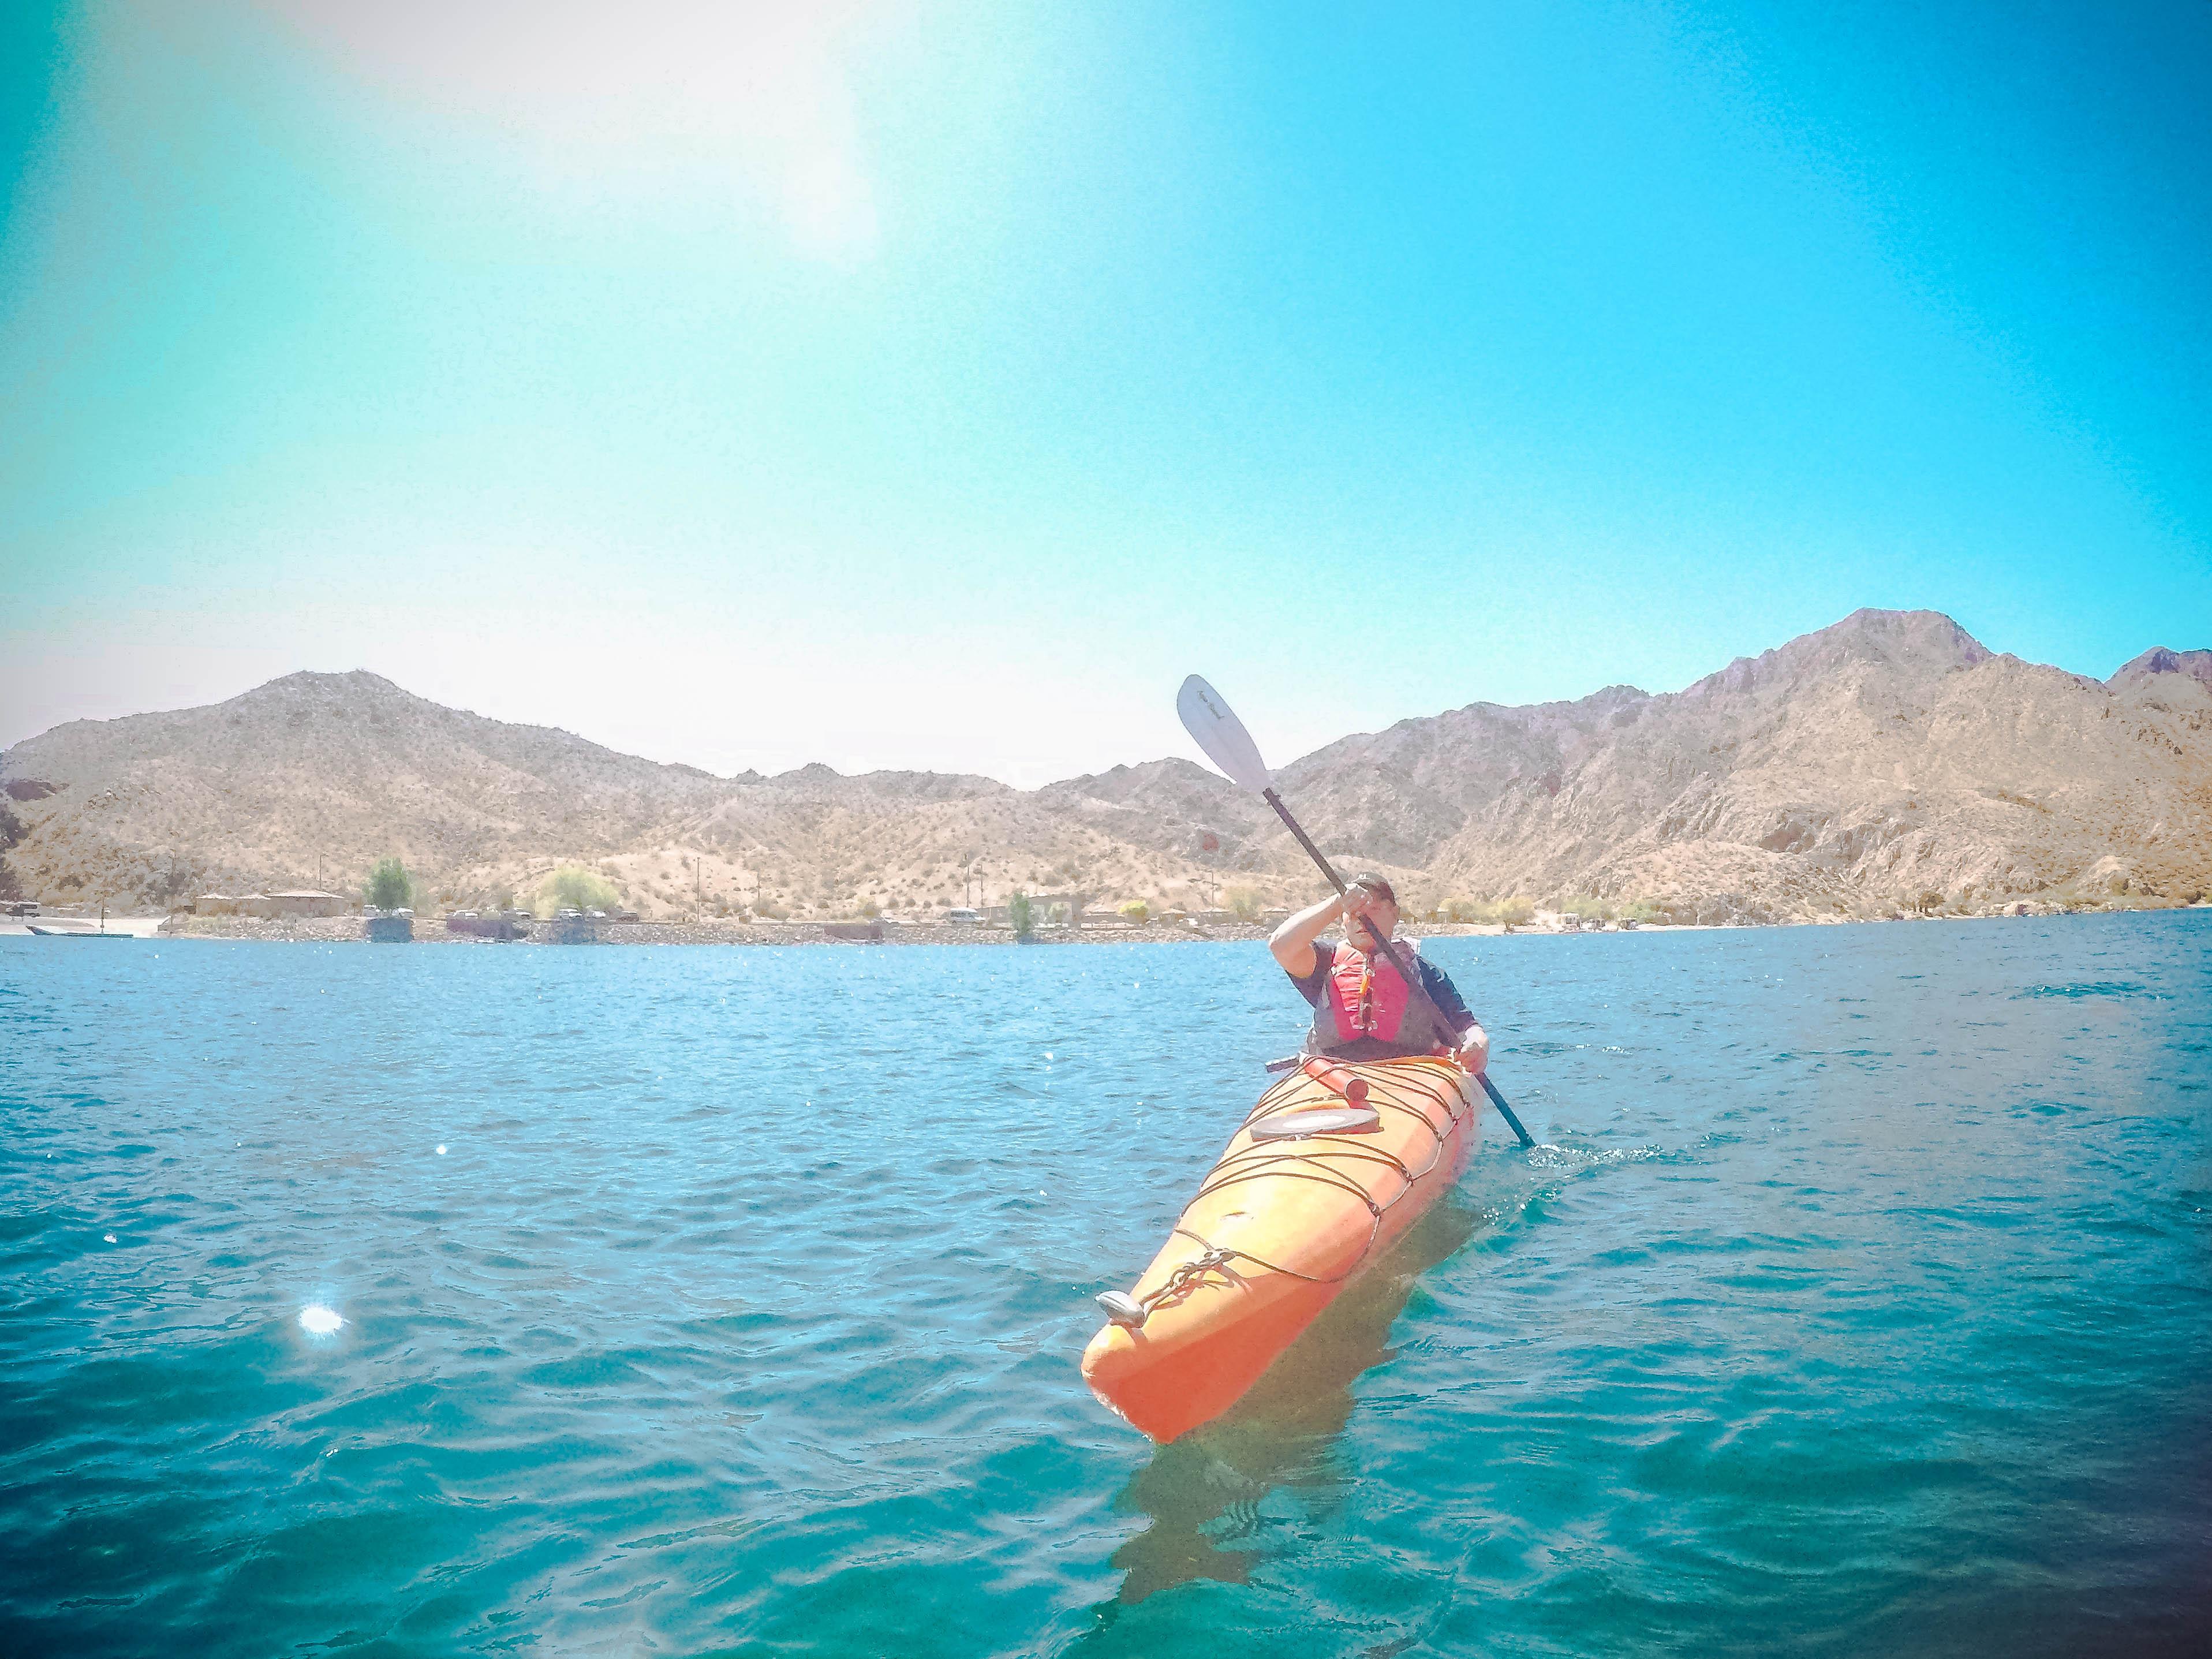 kayaking the black canyon on colorado river arizona